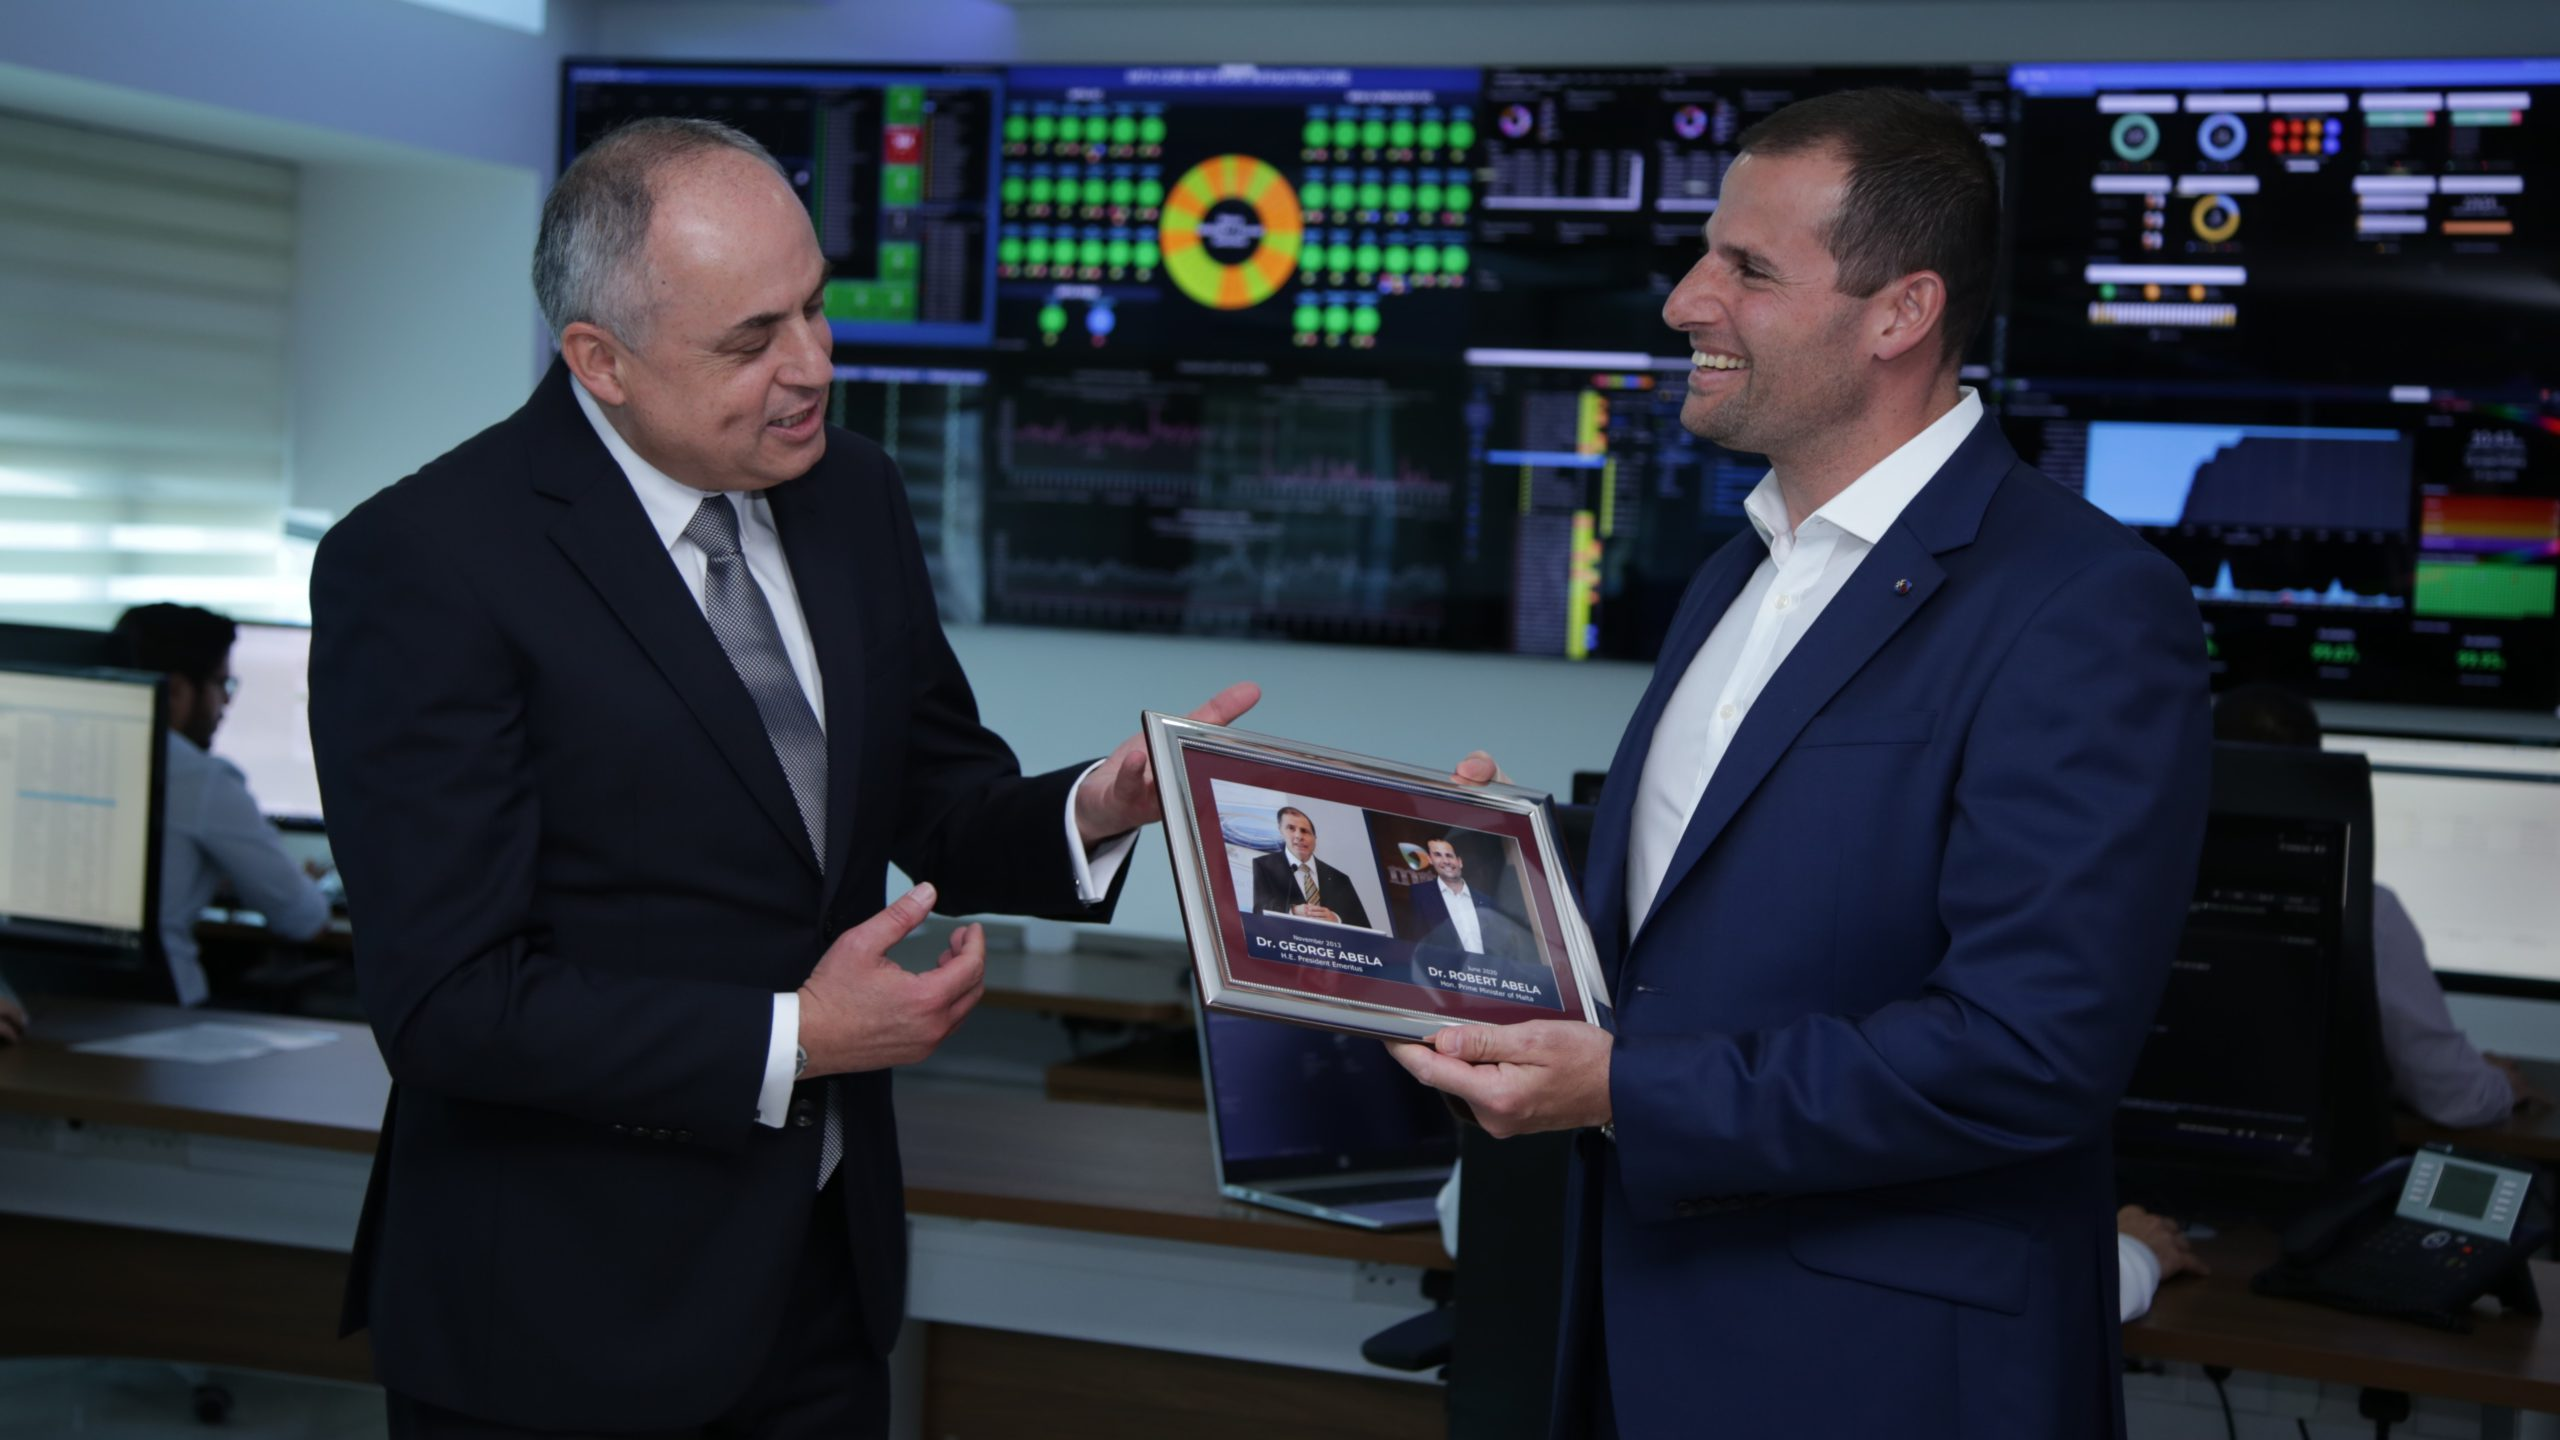 Prime Minister visit at MITA Data Centre